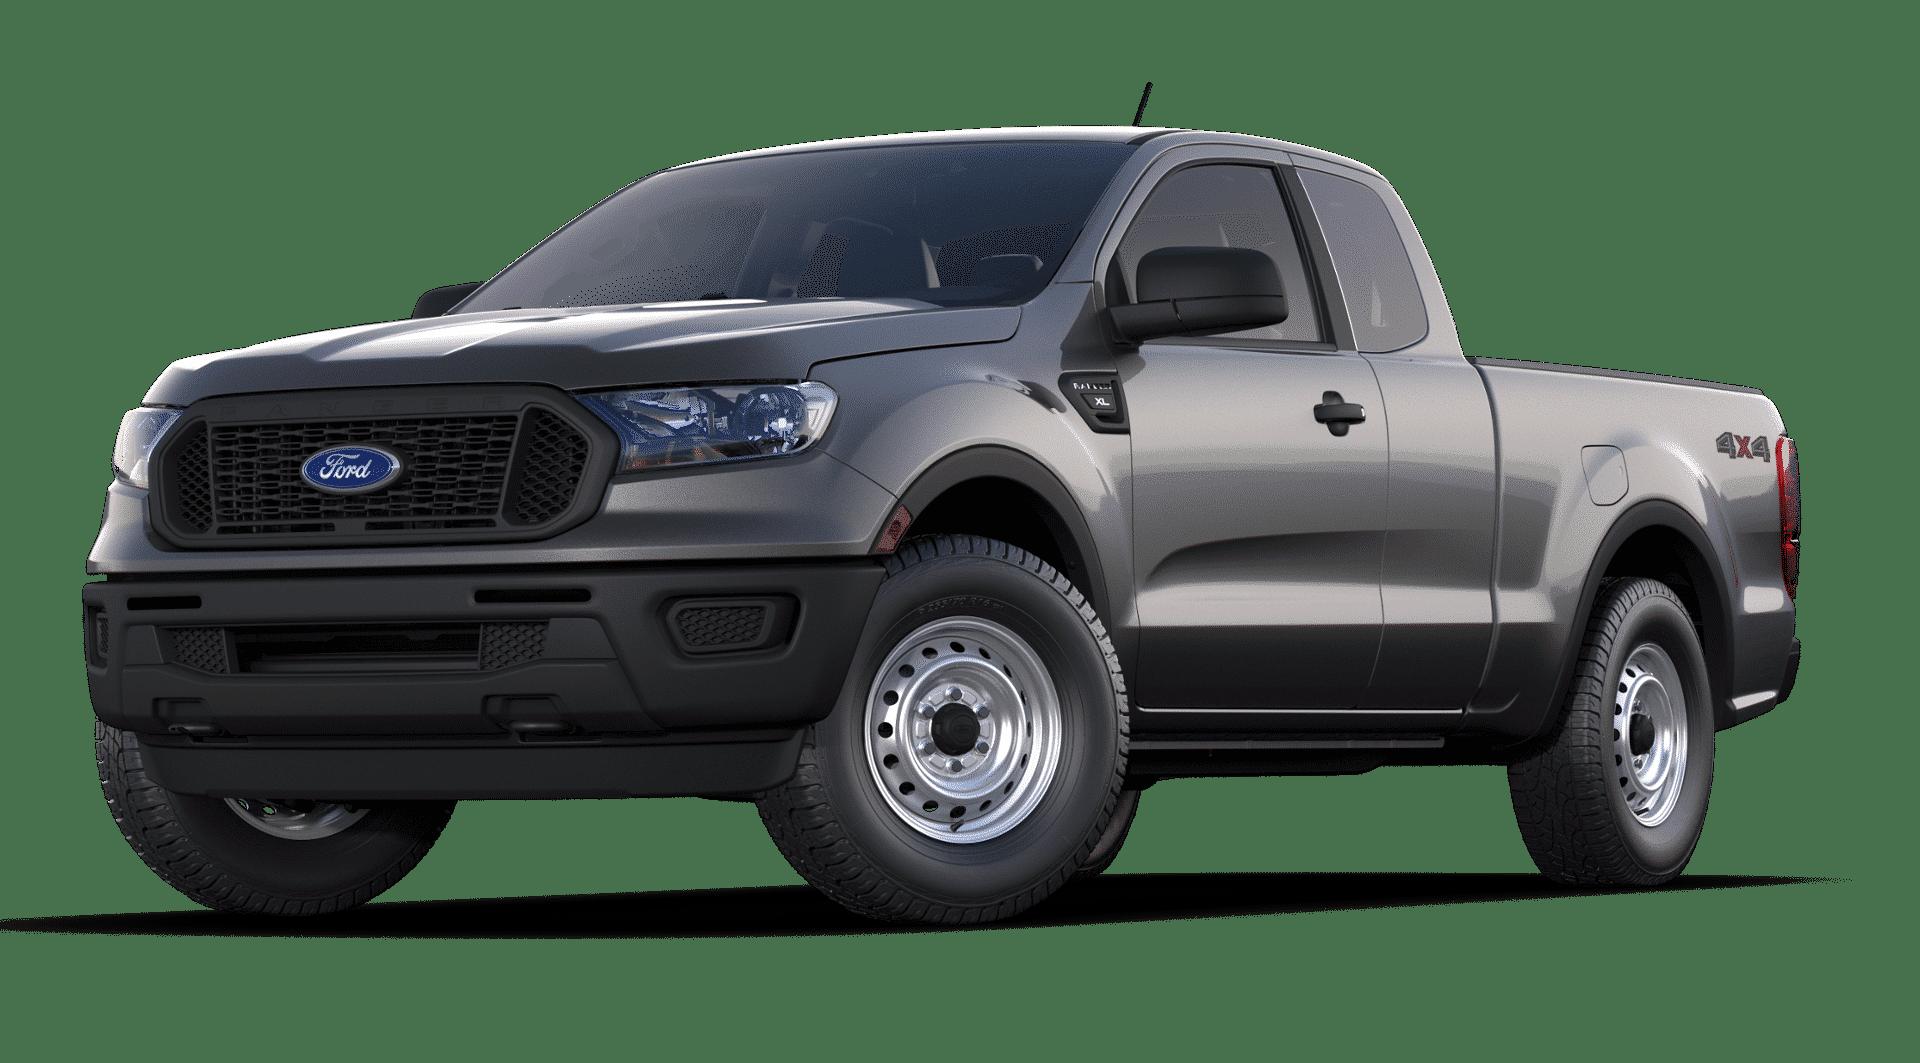 2020 Ford Ranger Dealer Cost Report